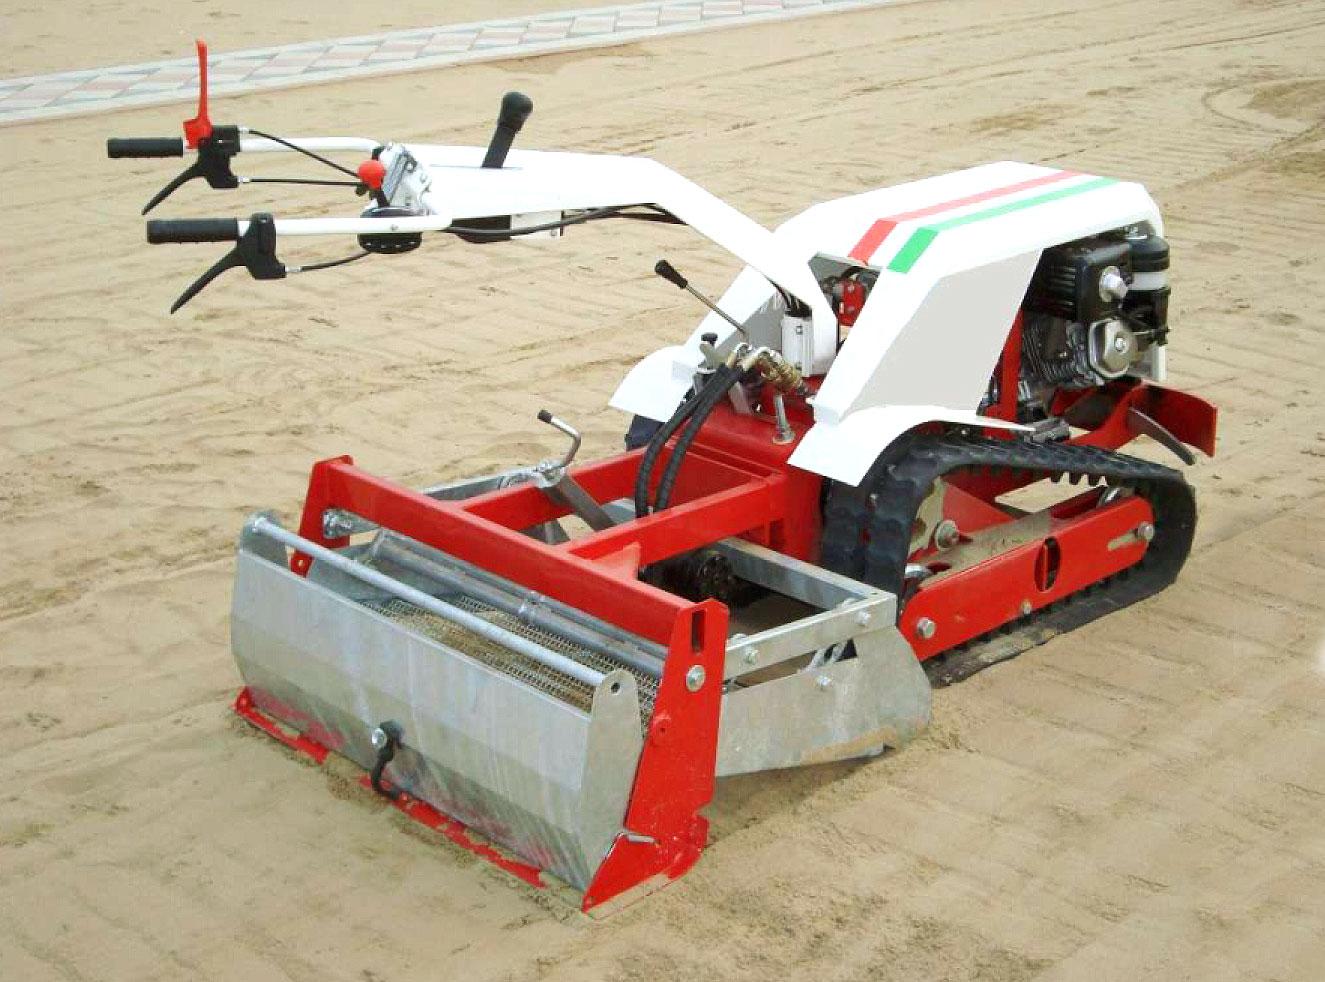 Limpiador de playas BZS90 Windland